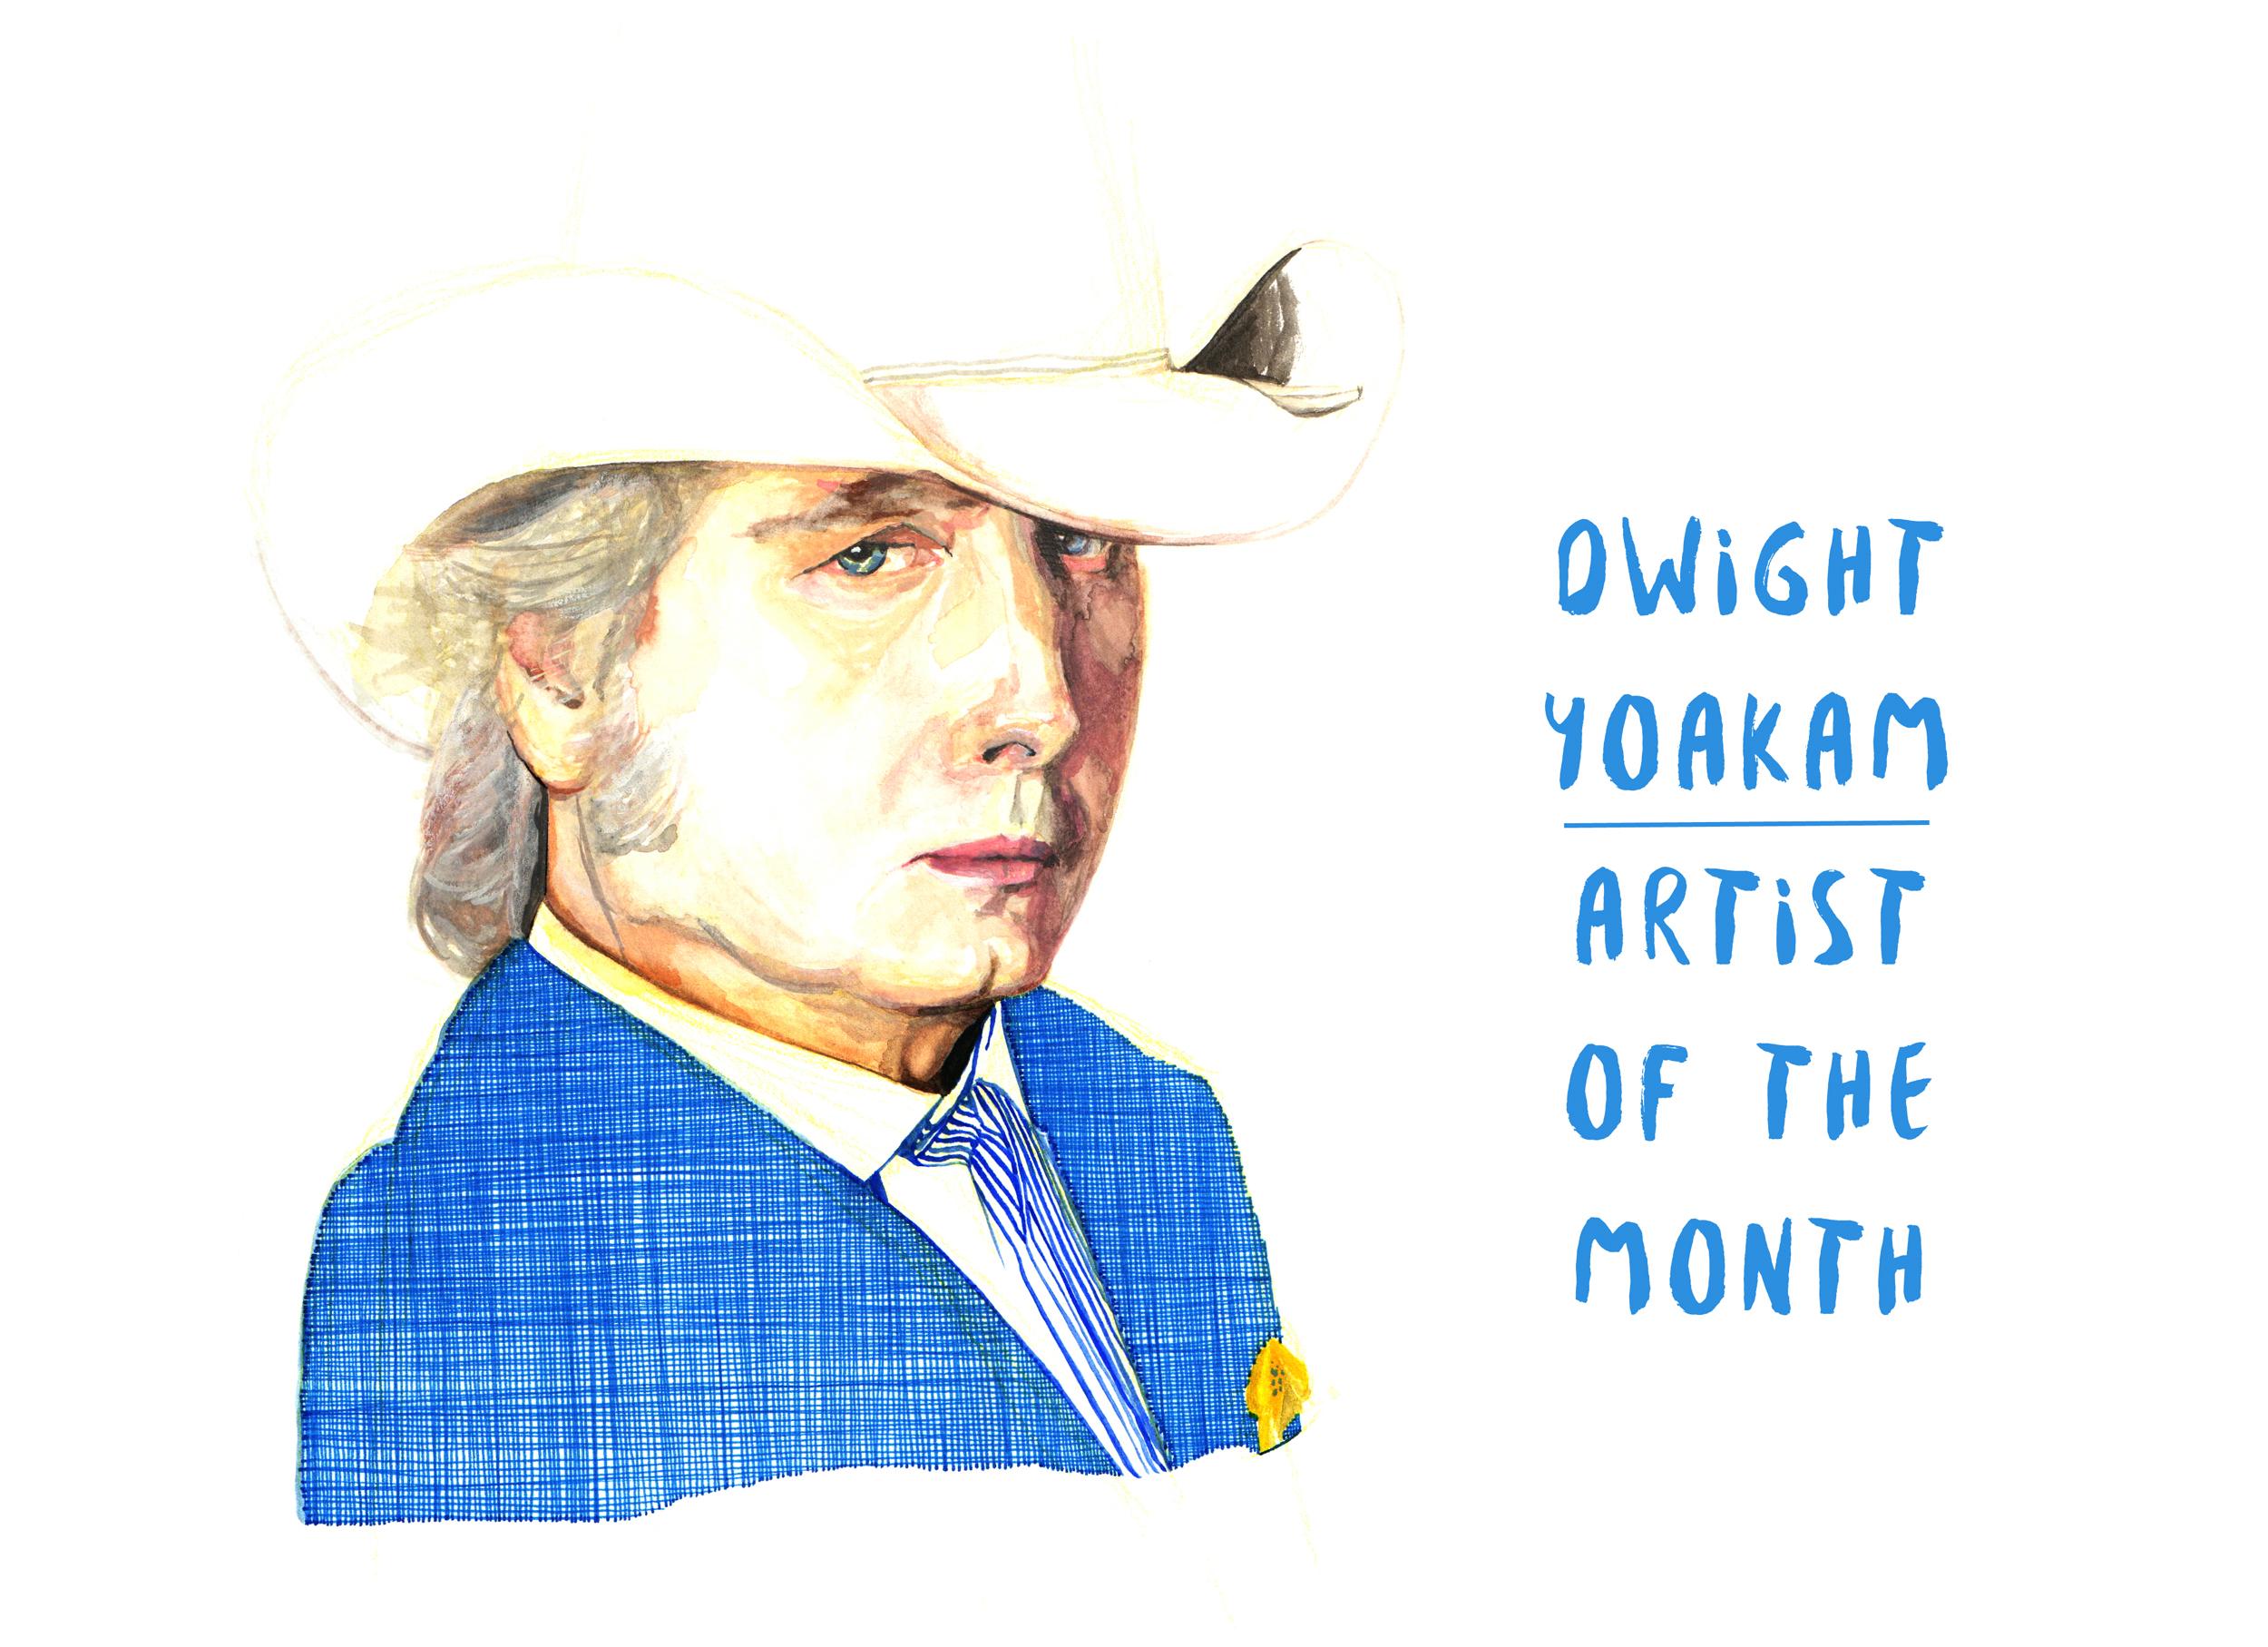 Dwight Yoakam: The Kentucky Son's Bluegrass Birthright